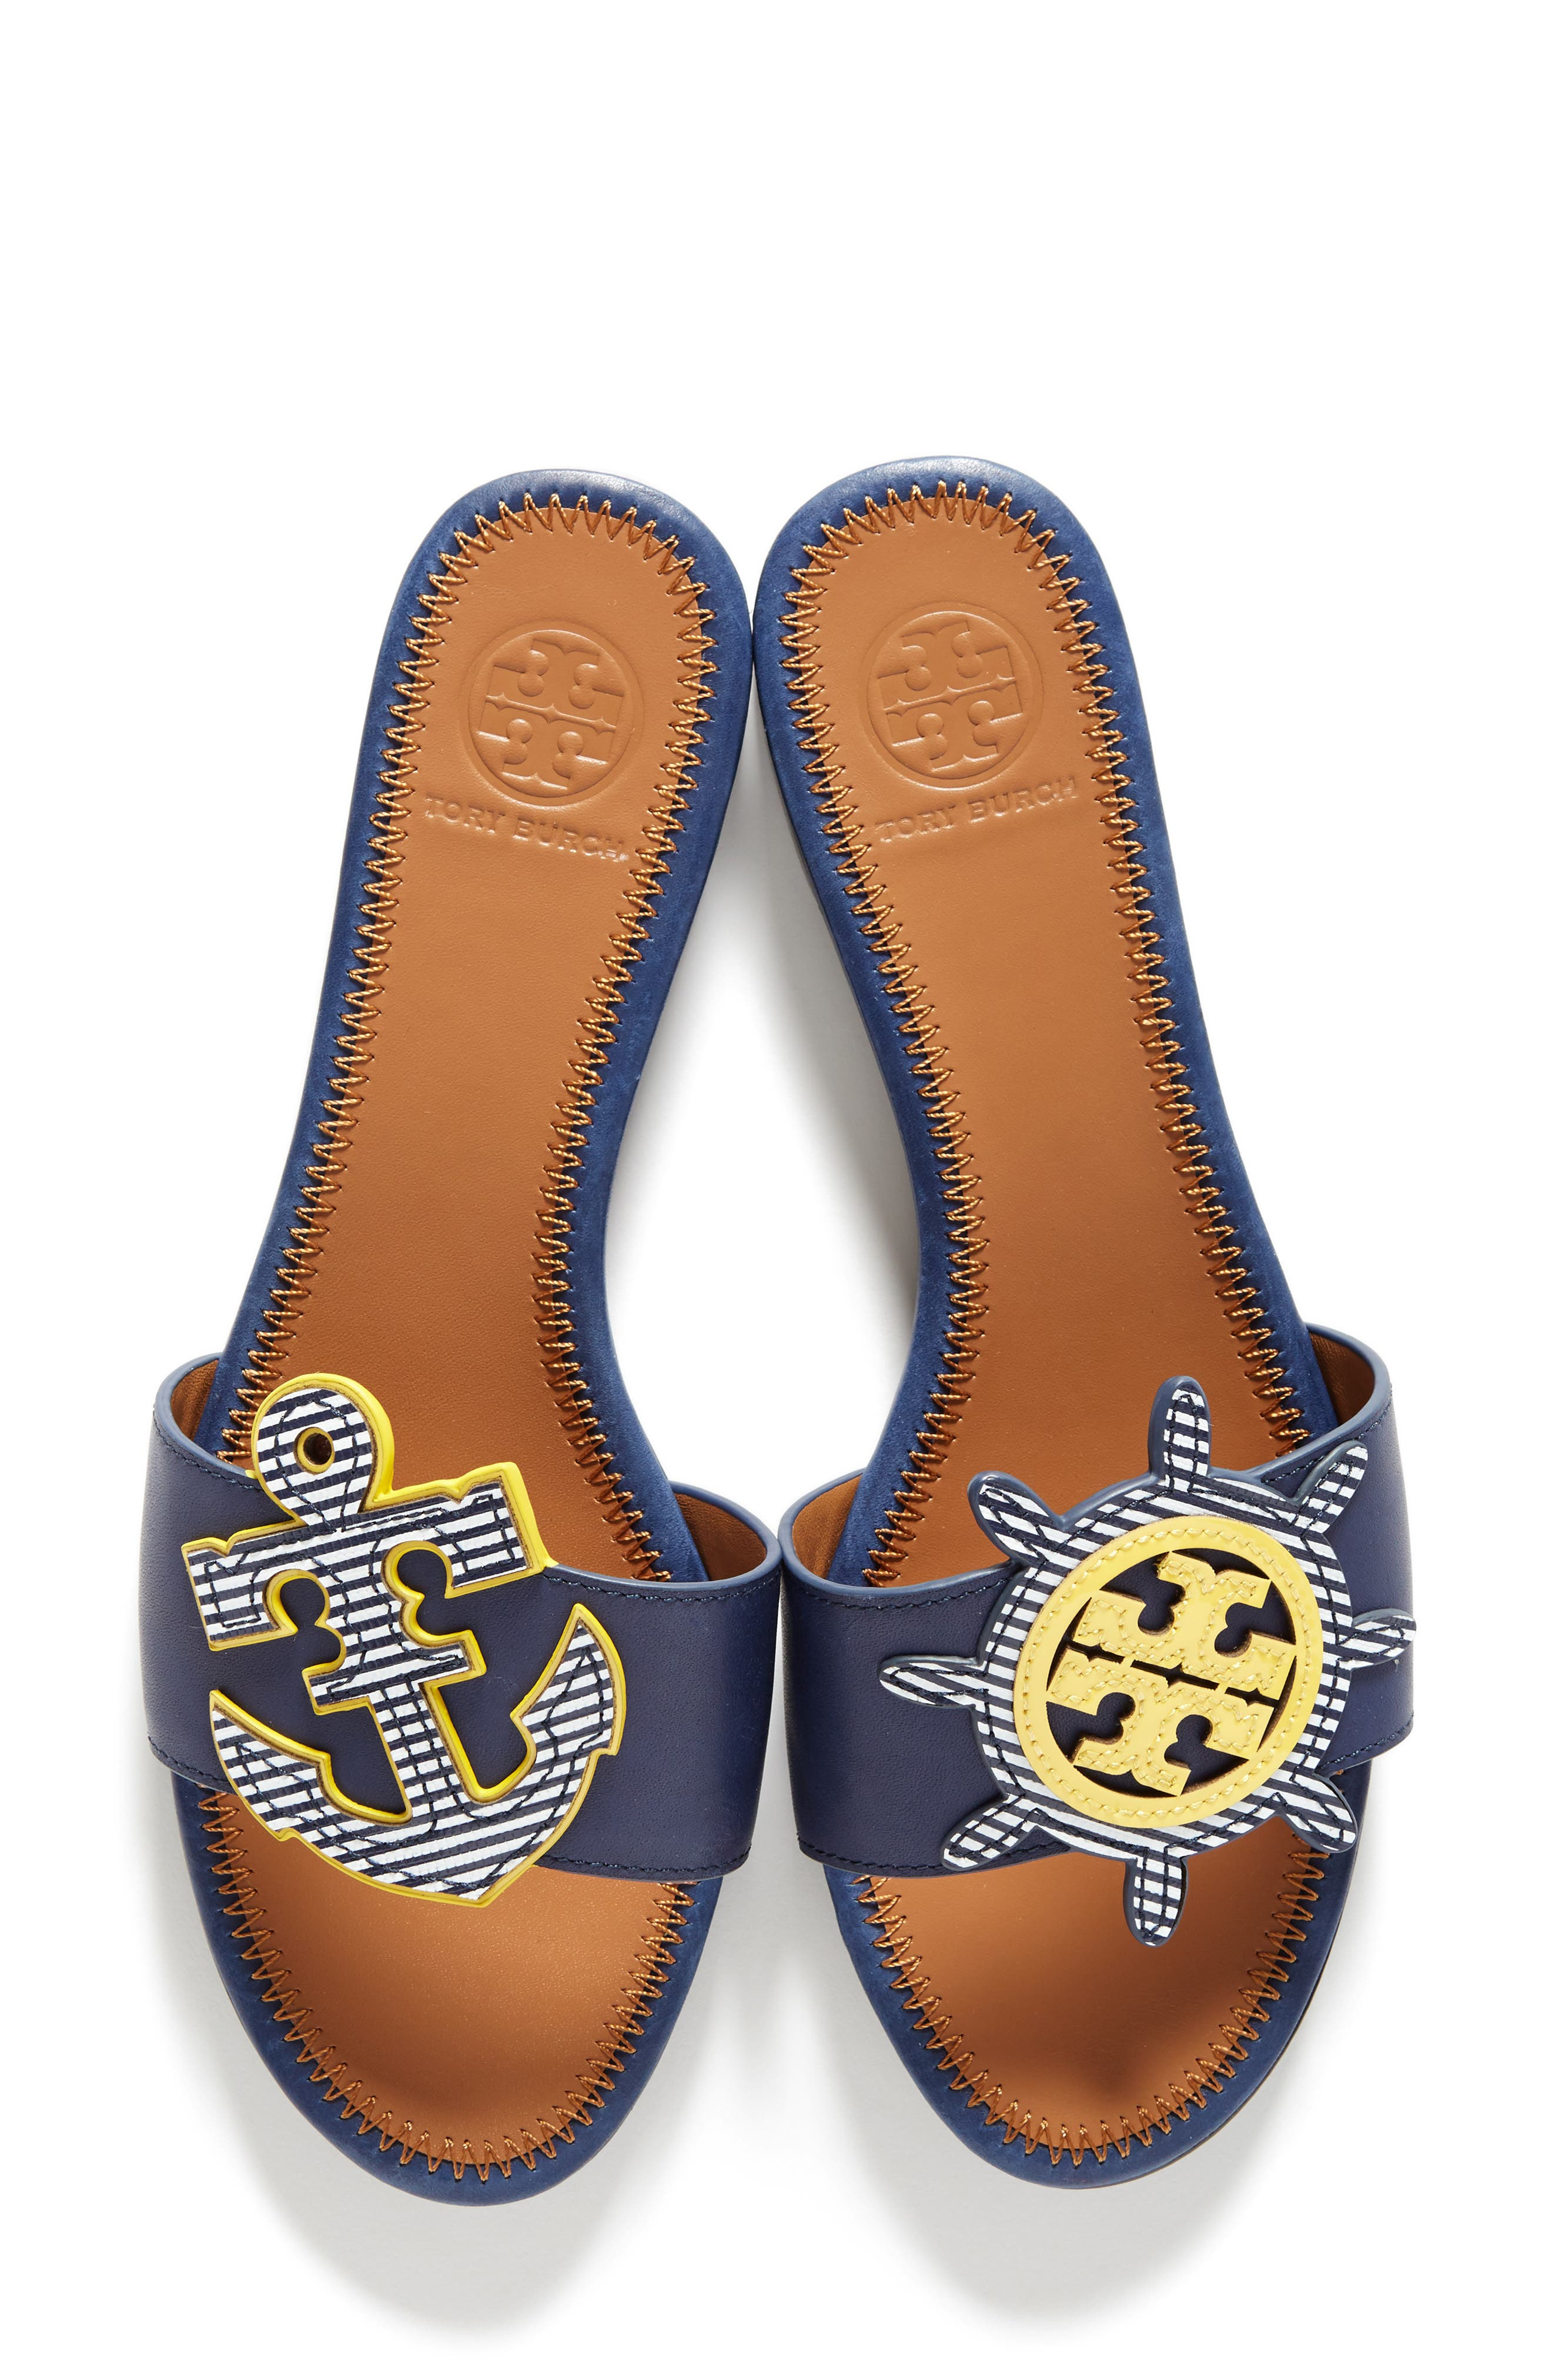 Main Image - Tory Burch Maritime Slide Sandal (Women)